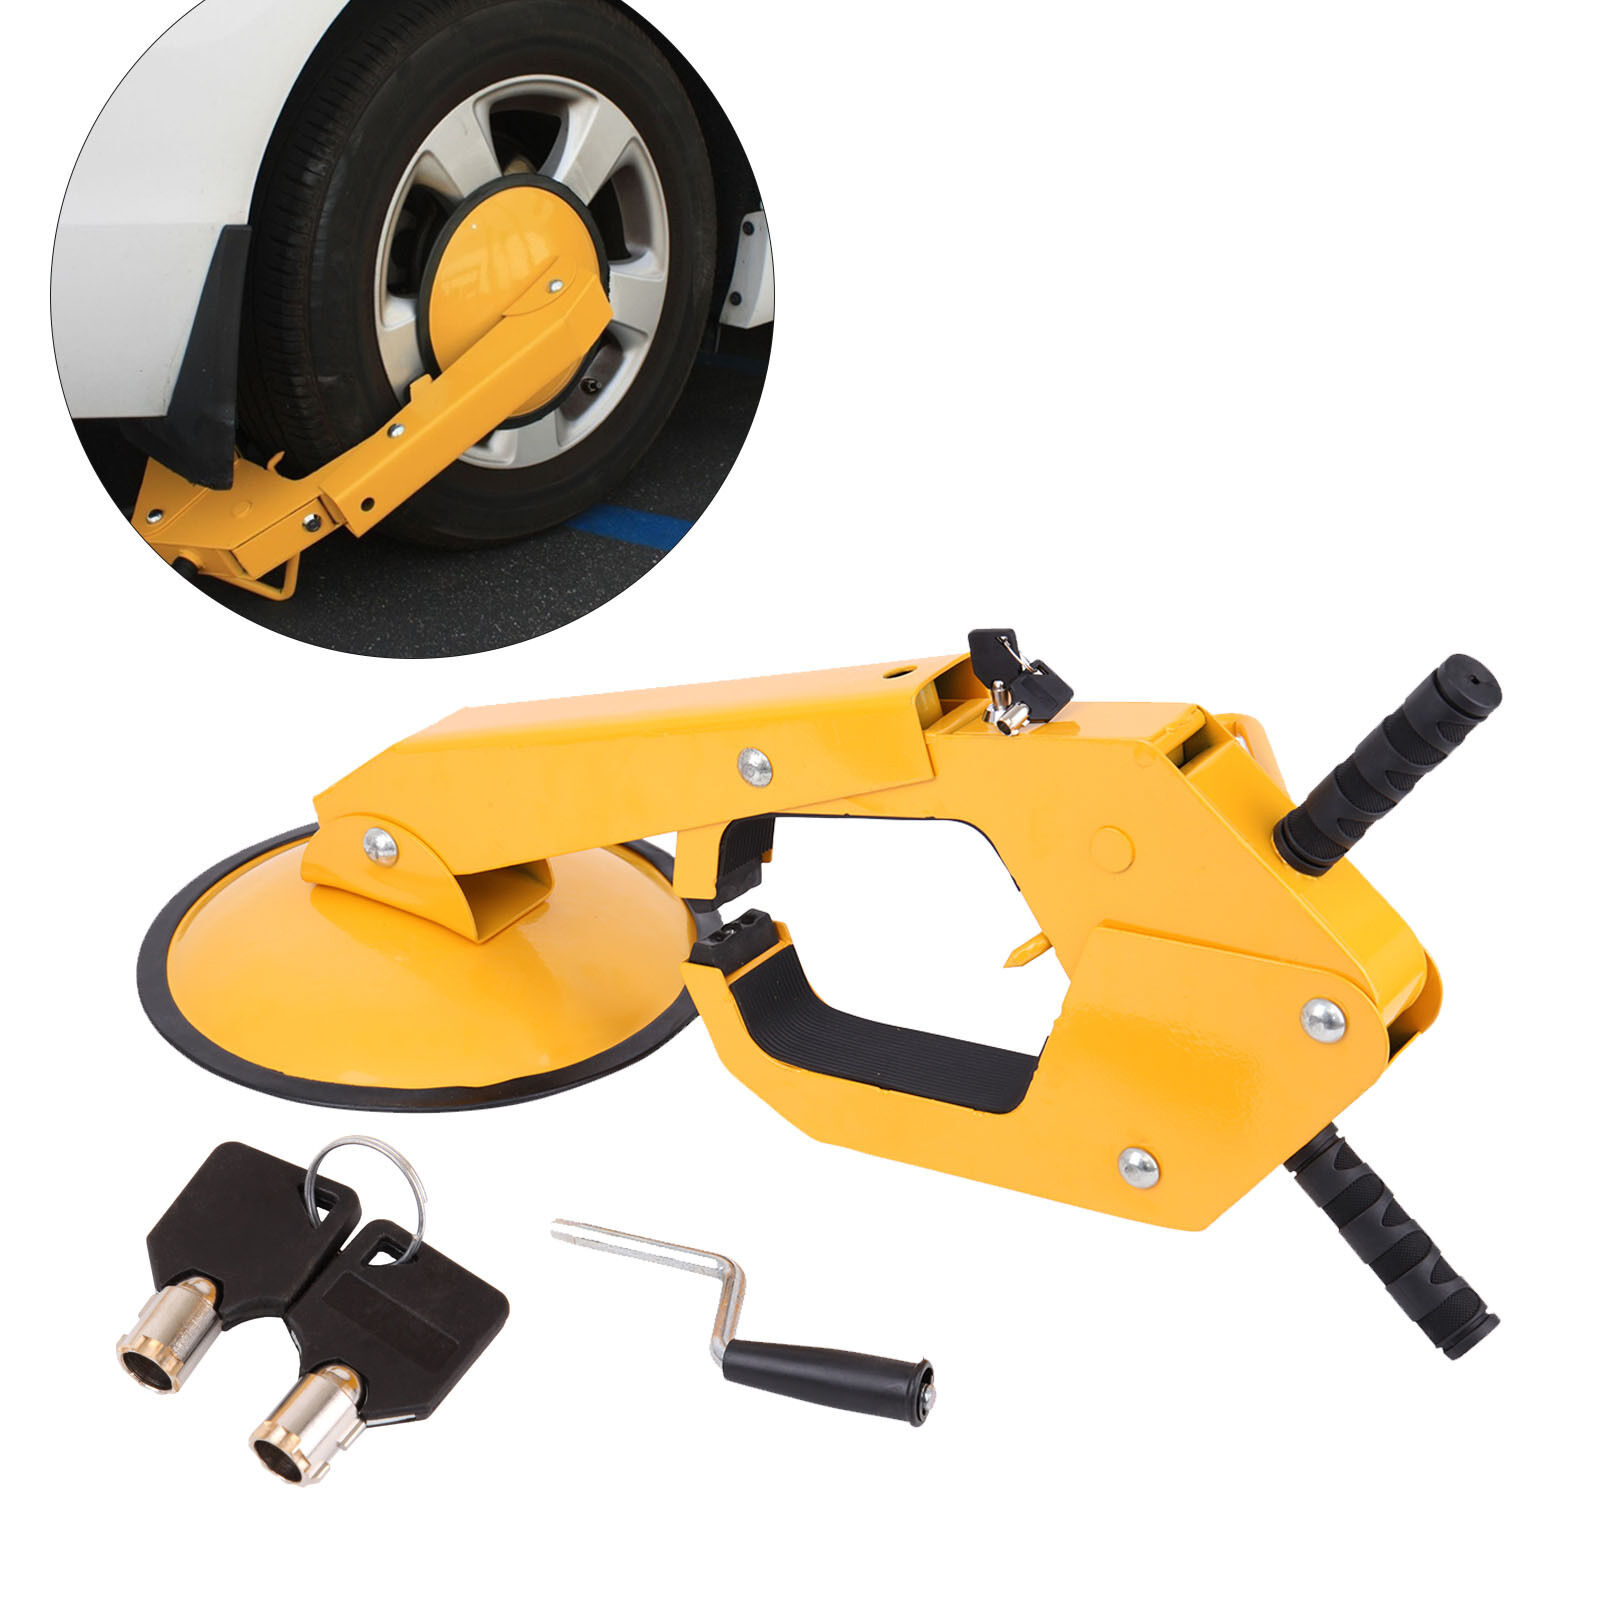 Wido CAR CARAVAN WHEEL CLAMP SECURITY MOBILE HOME LOCK TRAILER ANTI THEFT